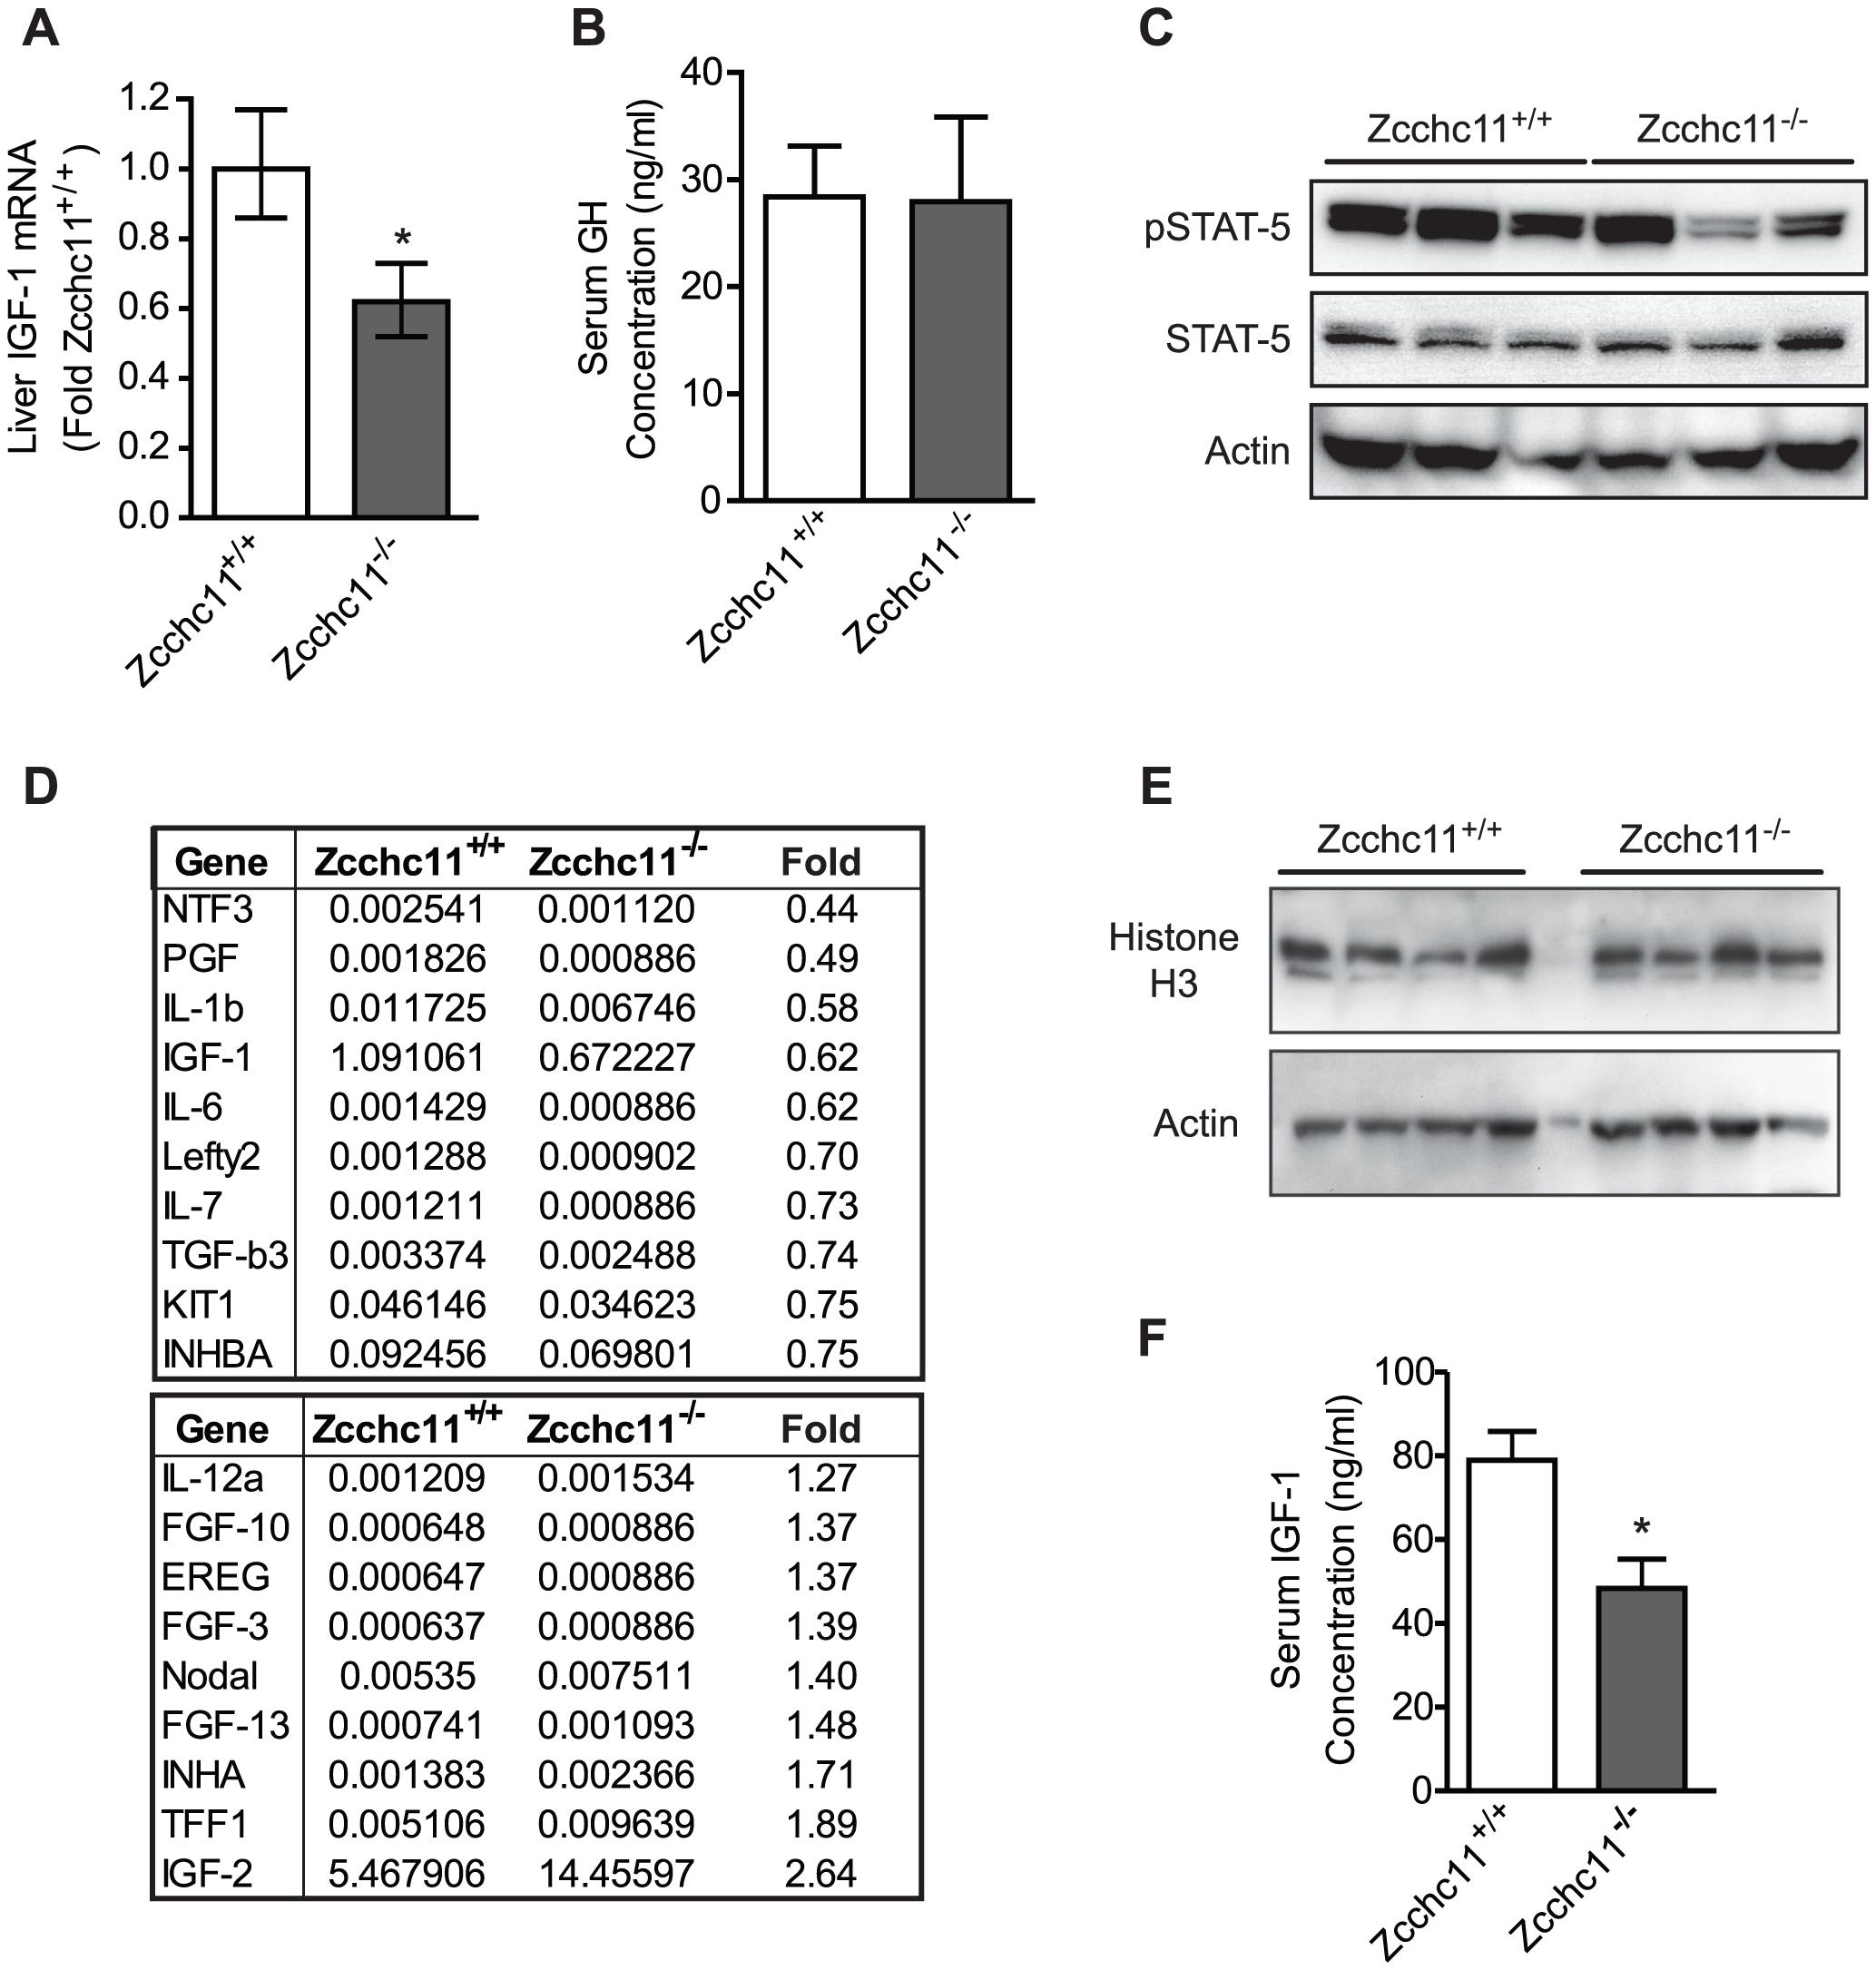 Zcchc11 deficiency decreases IGF-1 expression <i>in vivo</i>.